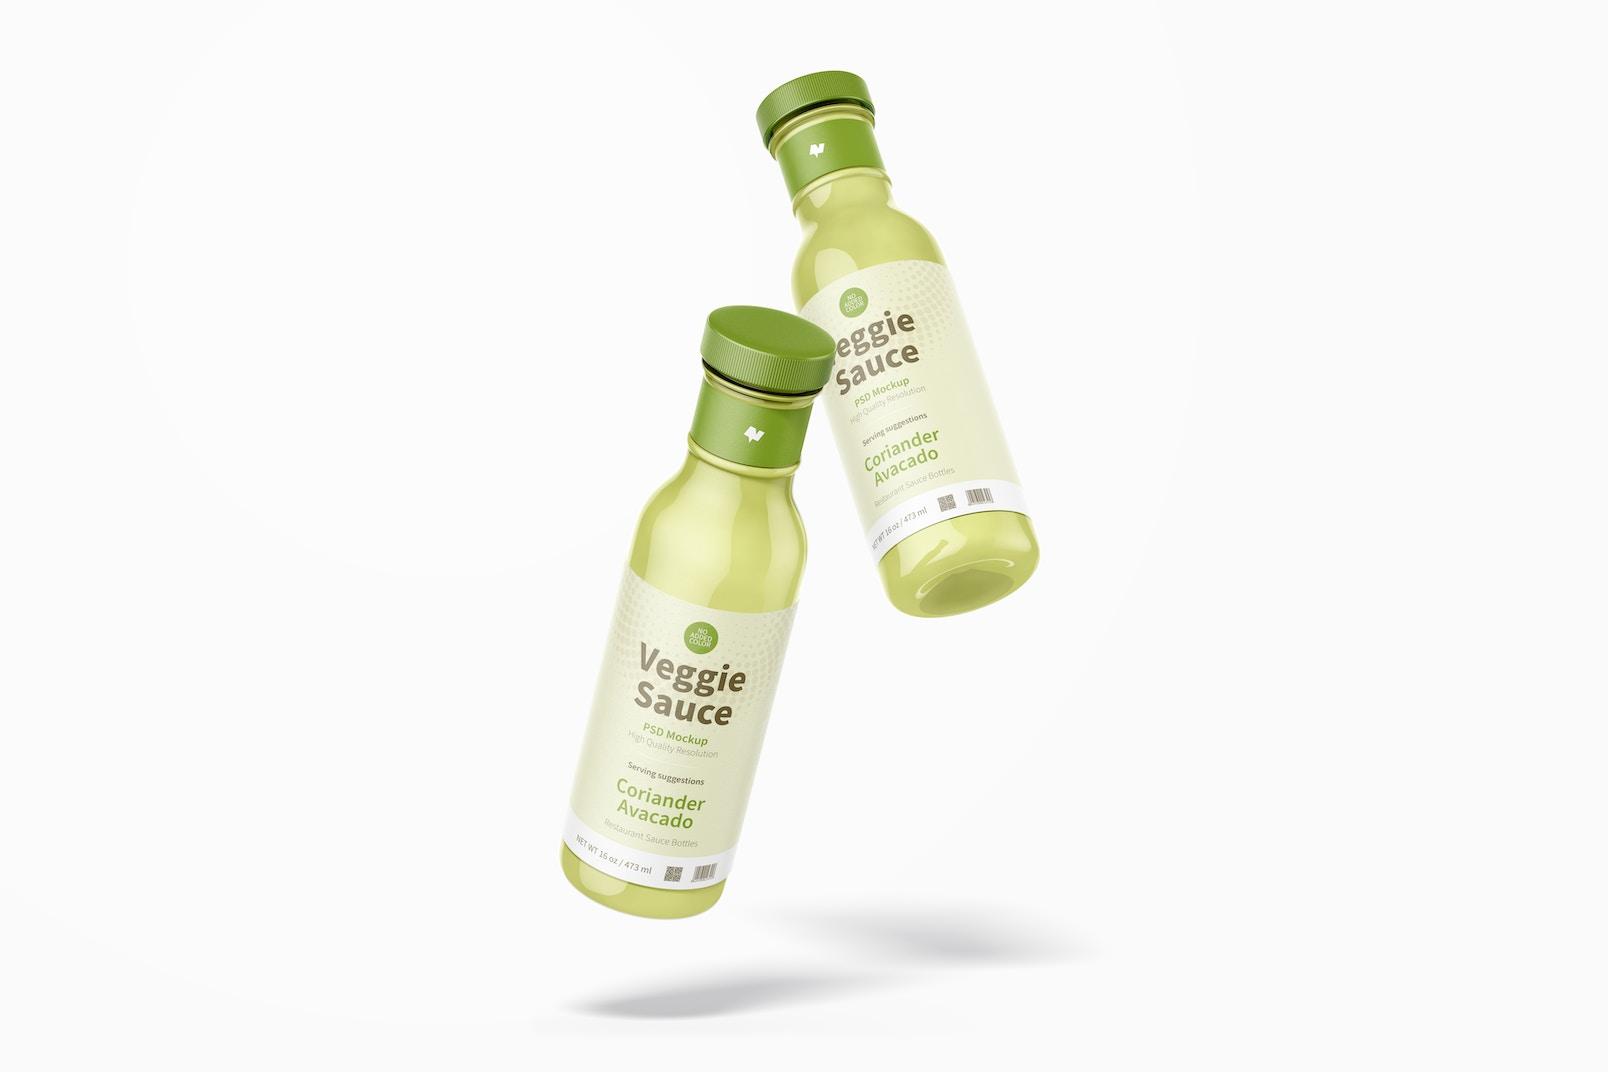 12 oz Veggie Sauce Bottle Mockup, Floating